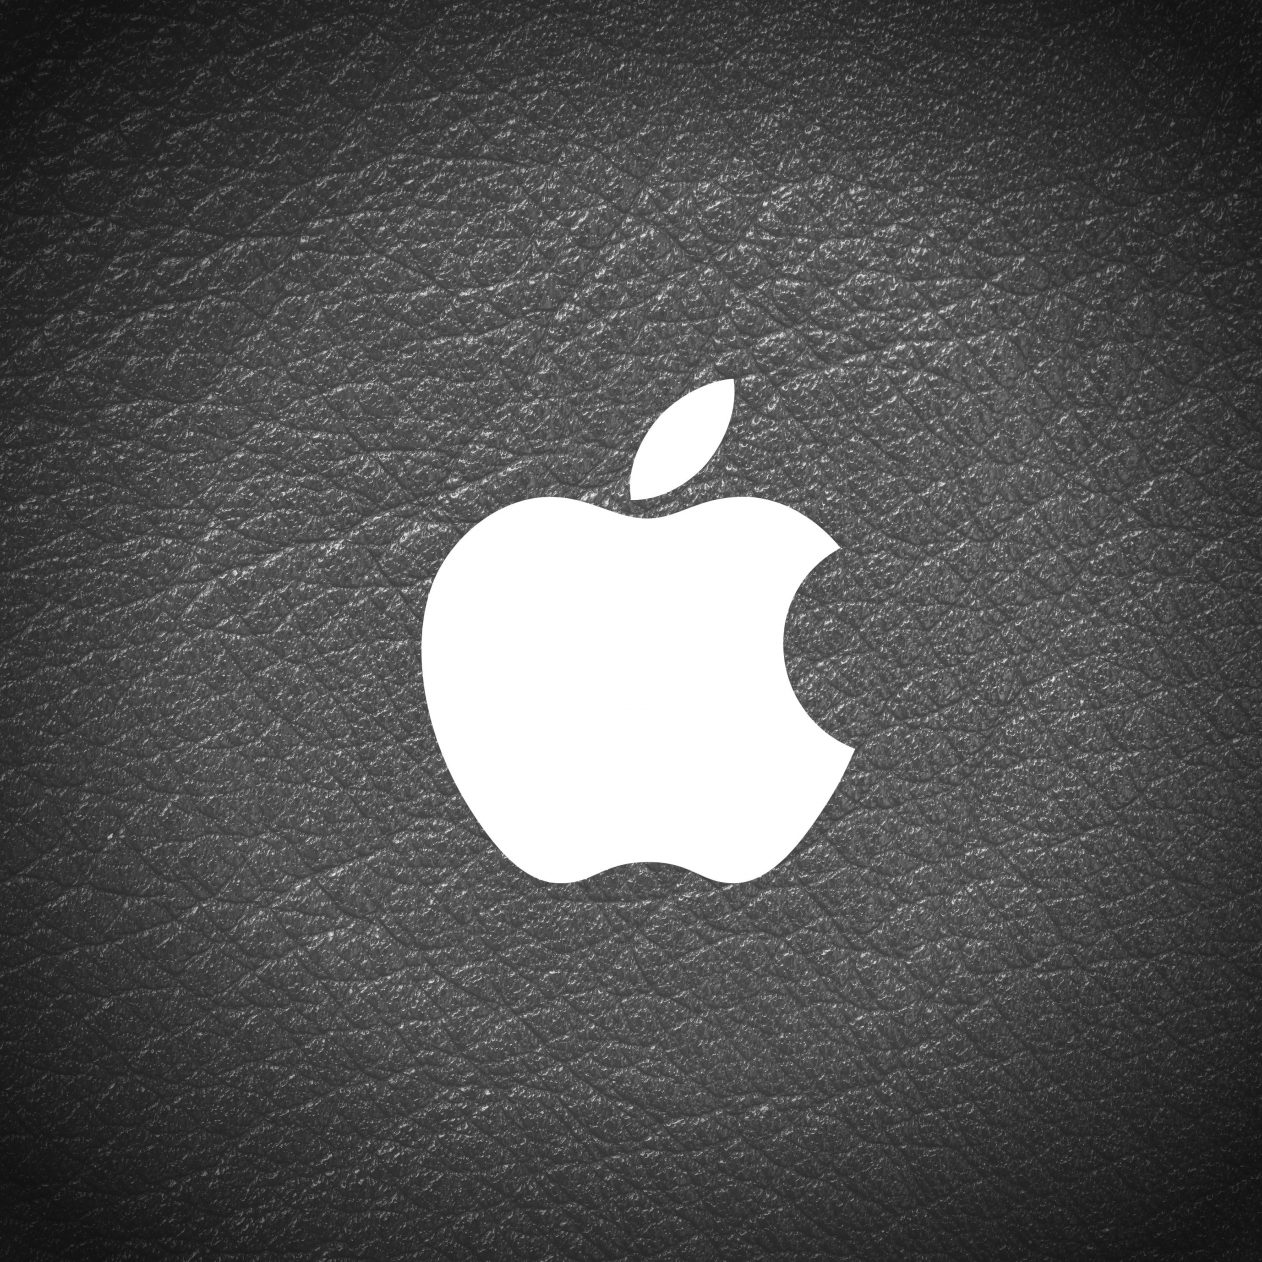 1262x1262 Parallax wallpaper 4k Apple Logo Leather Black and White iPad Wallpaper 1262x1262 pixels resolution